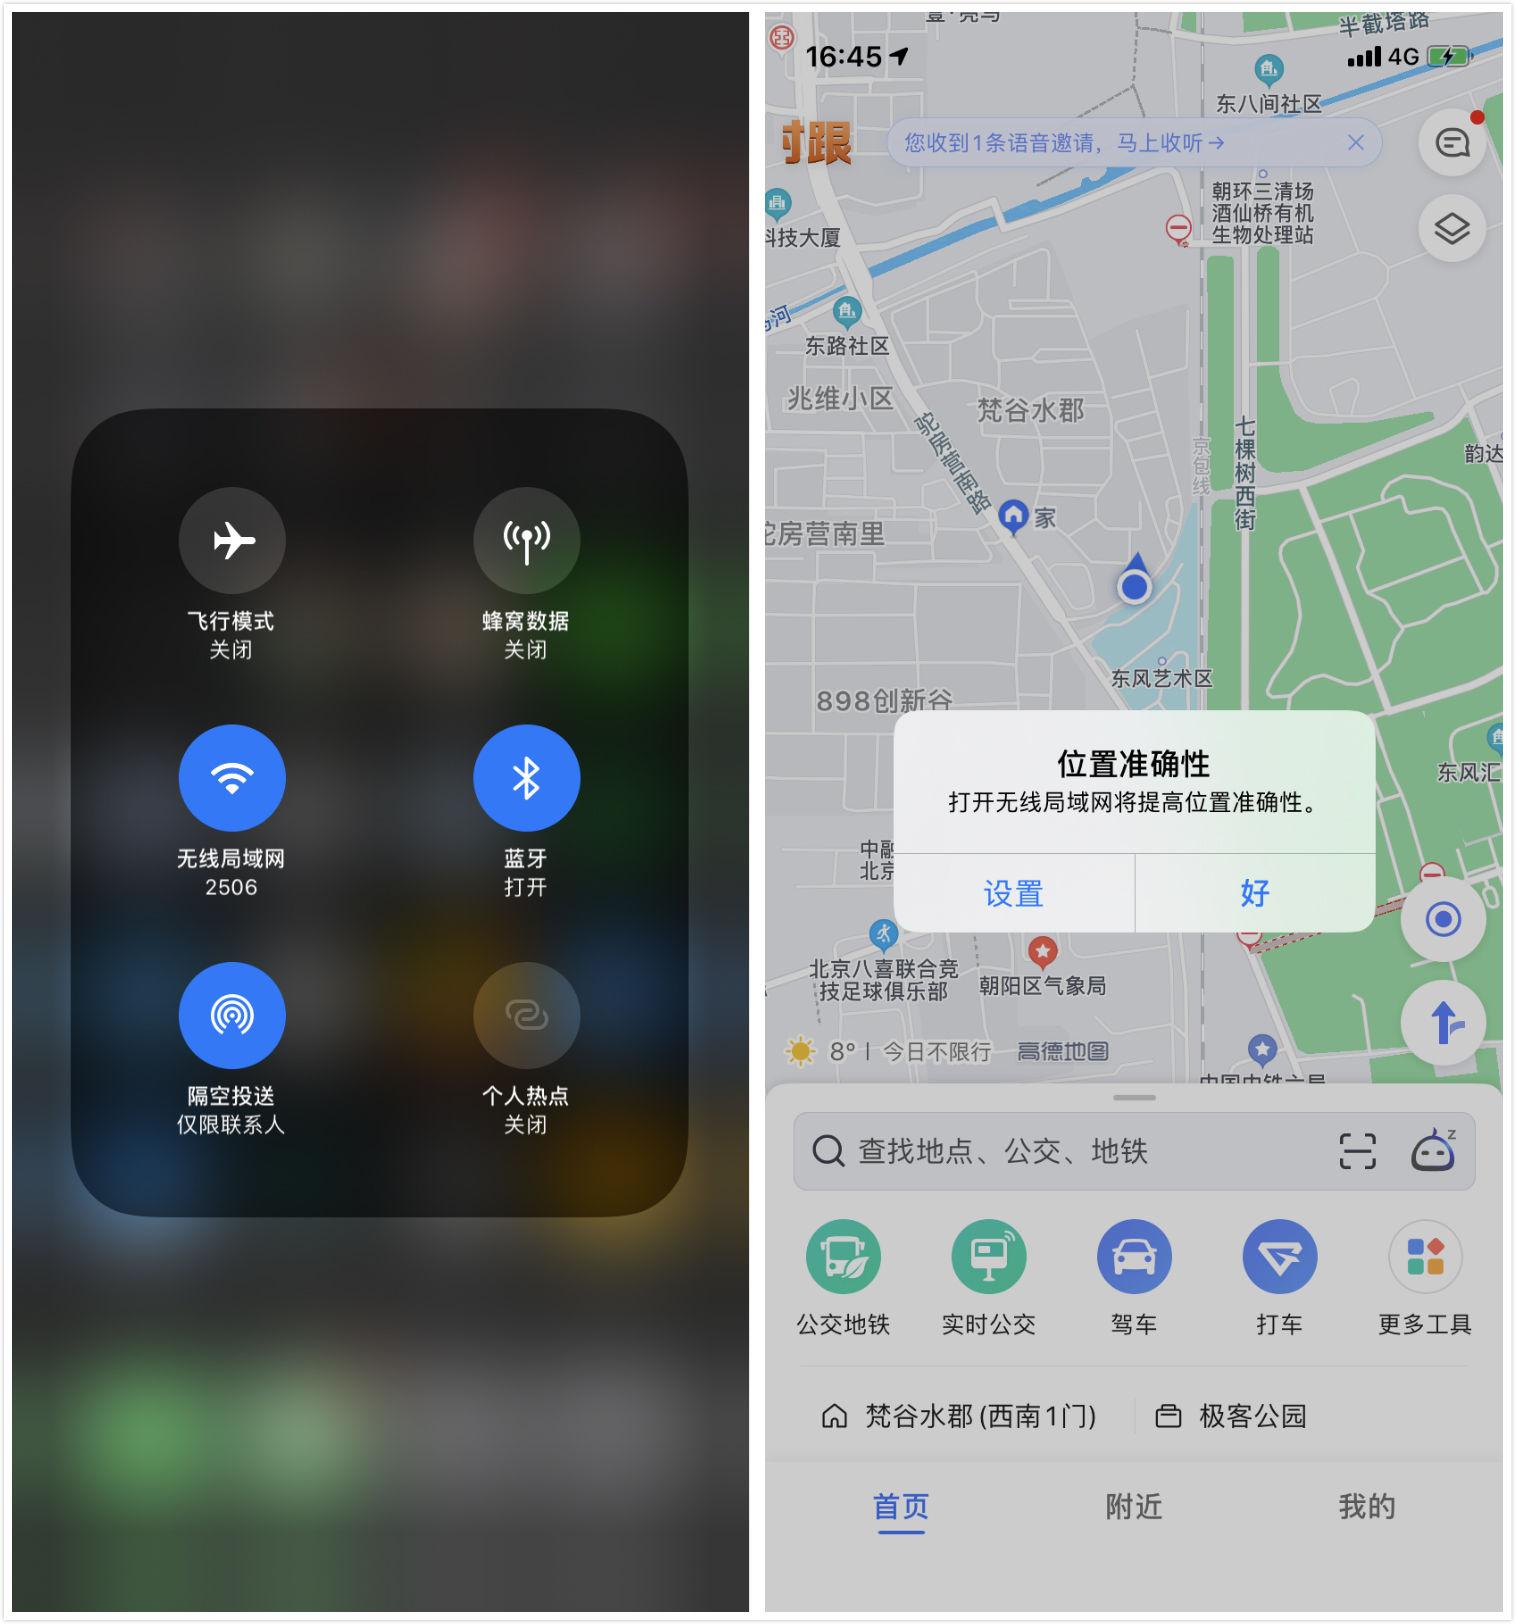 5e5cfb82eb461 - 滑动关闭 App 不能让 iPhone 变快,科技发展还给我们留下哪些后遗症?